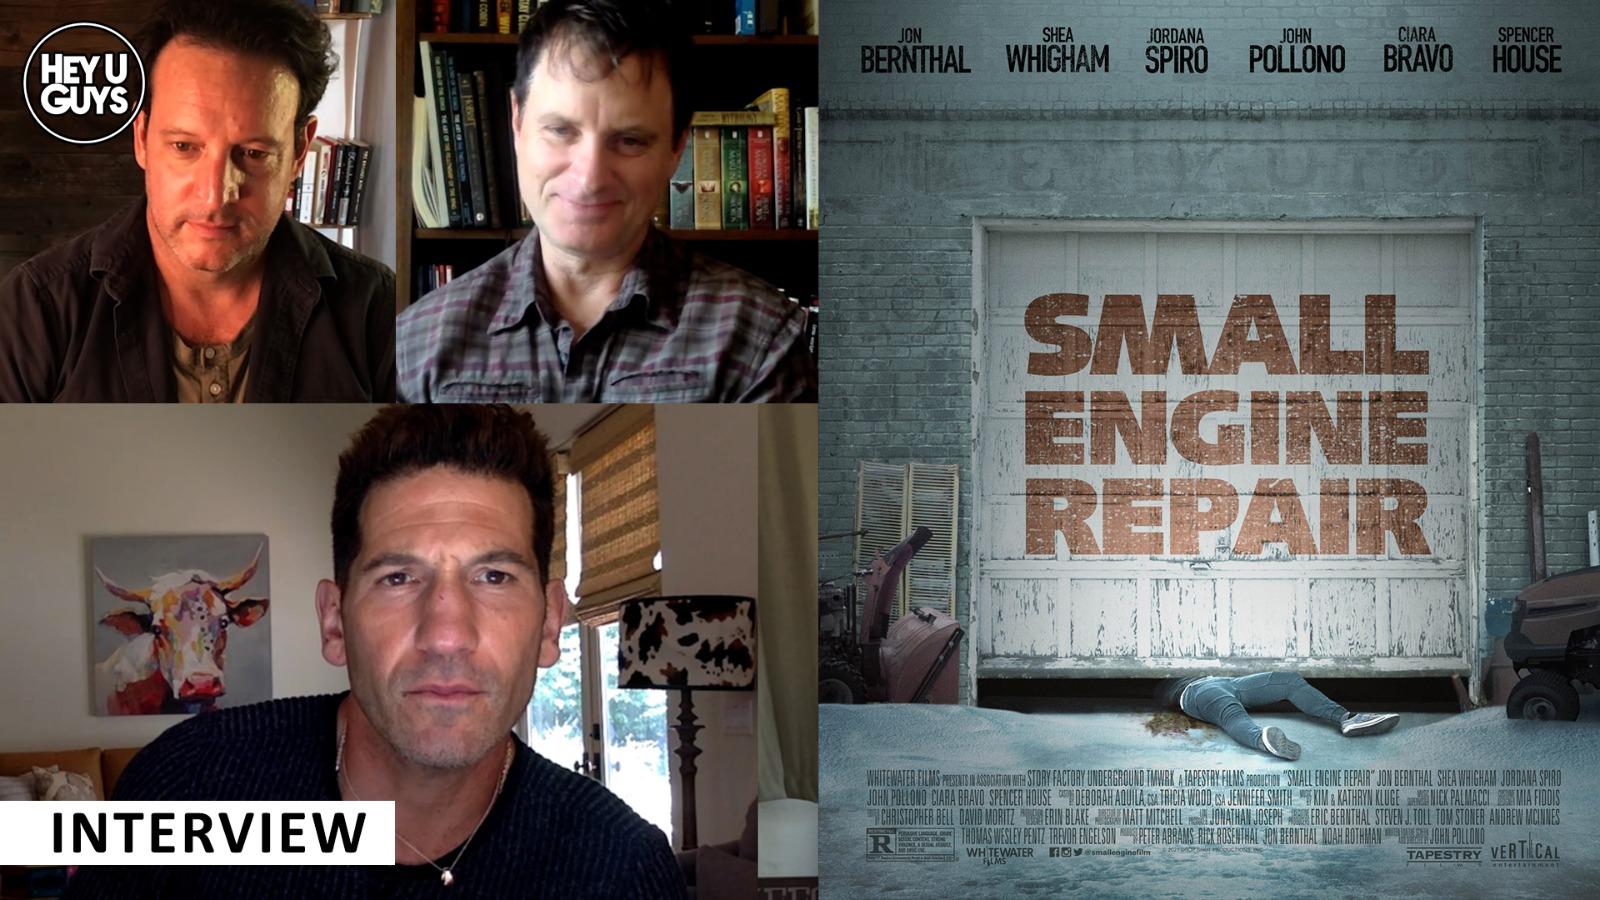 Small Engine Repair cast interviews